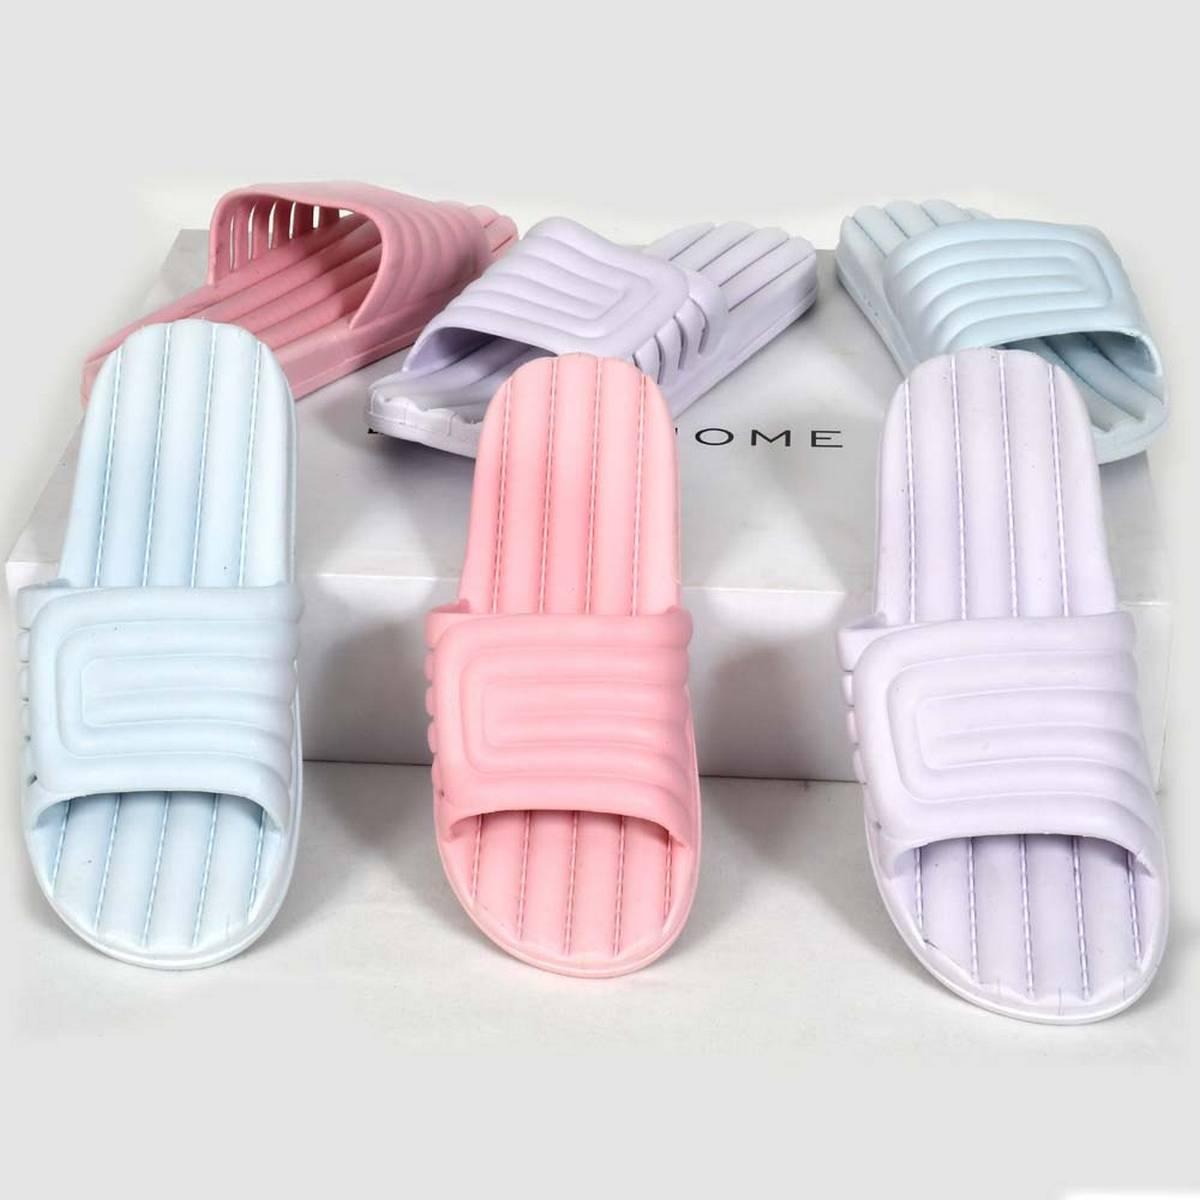 Carpet Slippers for Women- Indoor Bath Slippers for Girls- PVC Best Quality